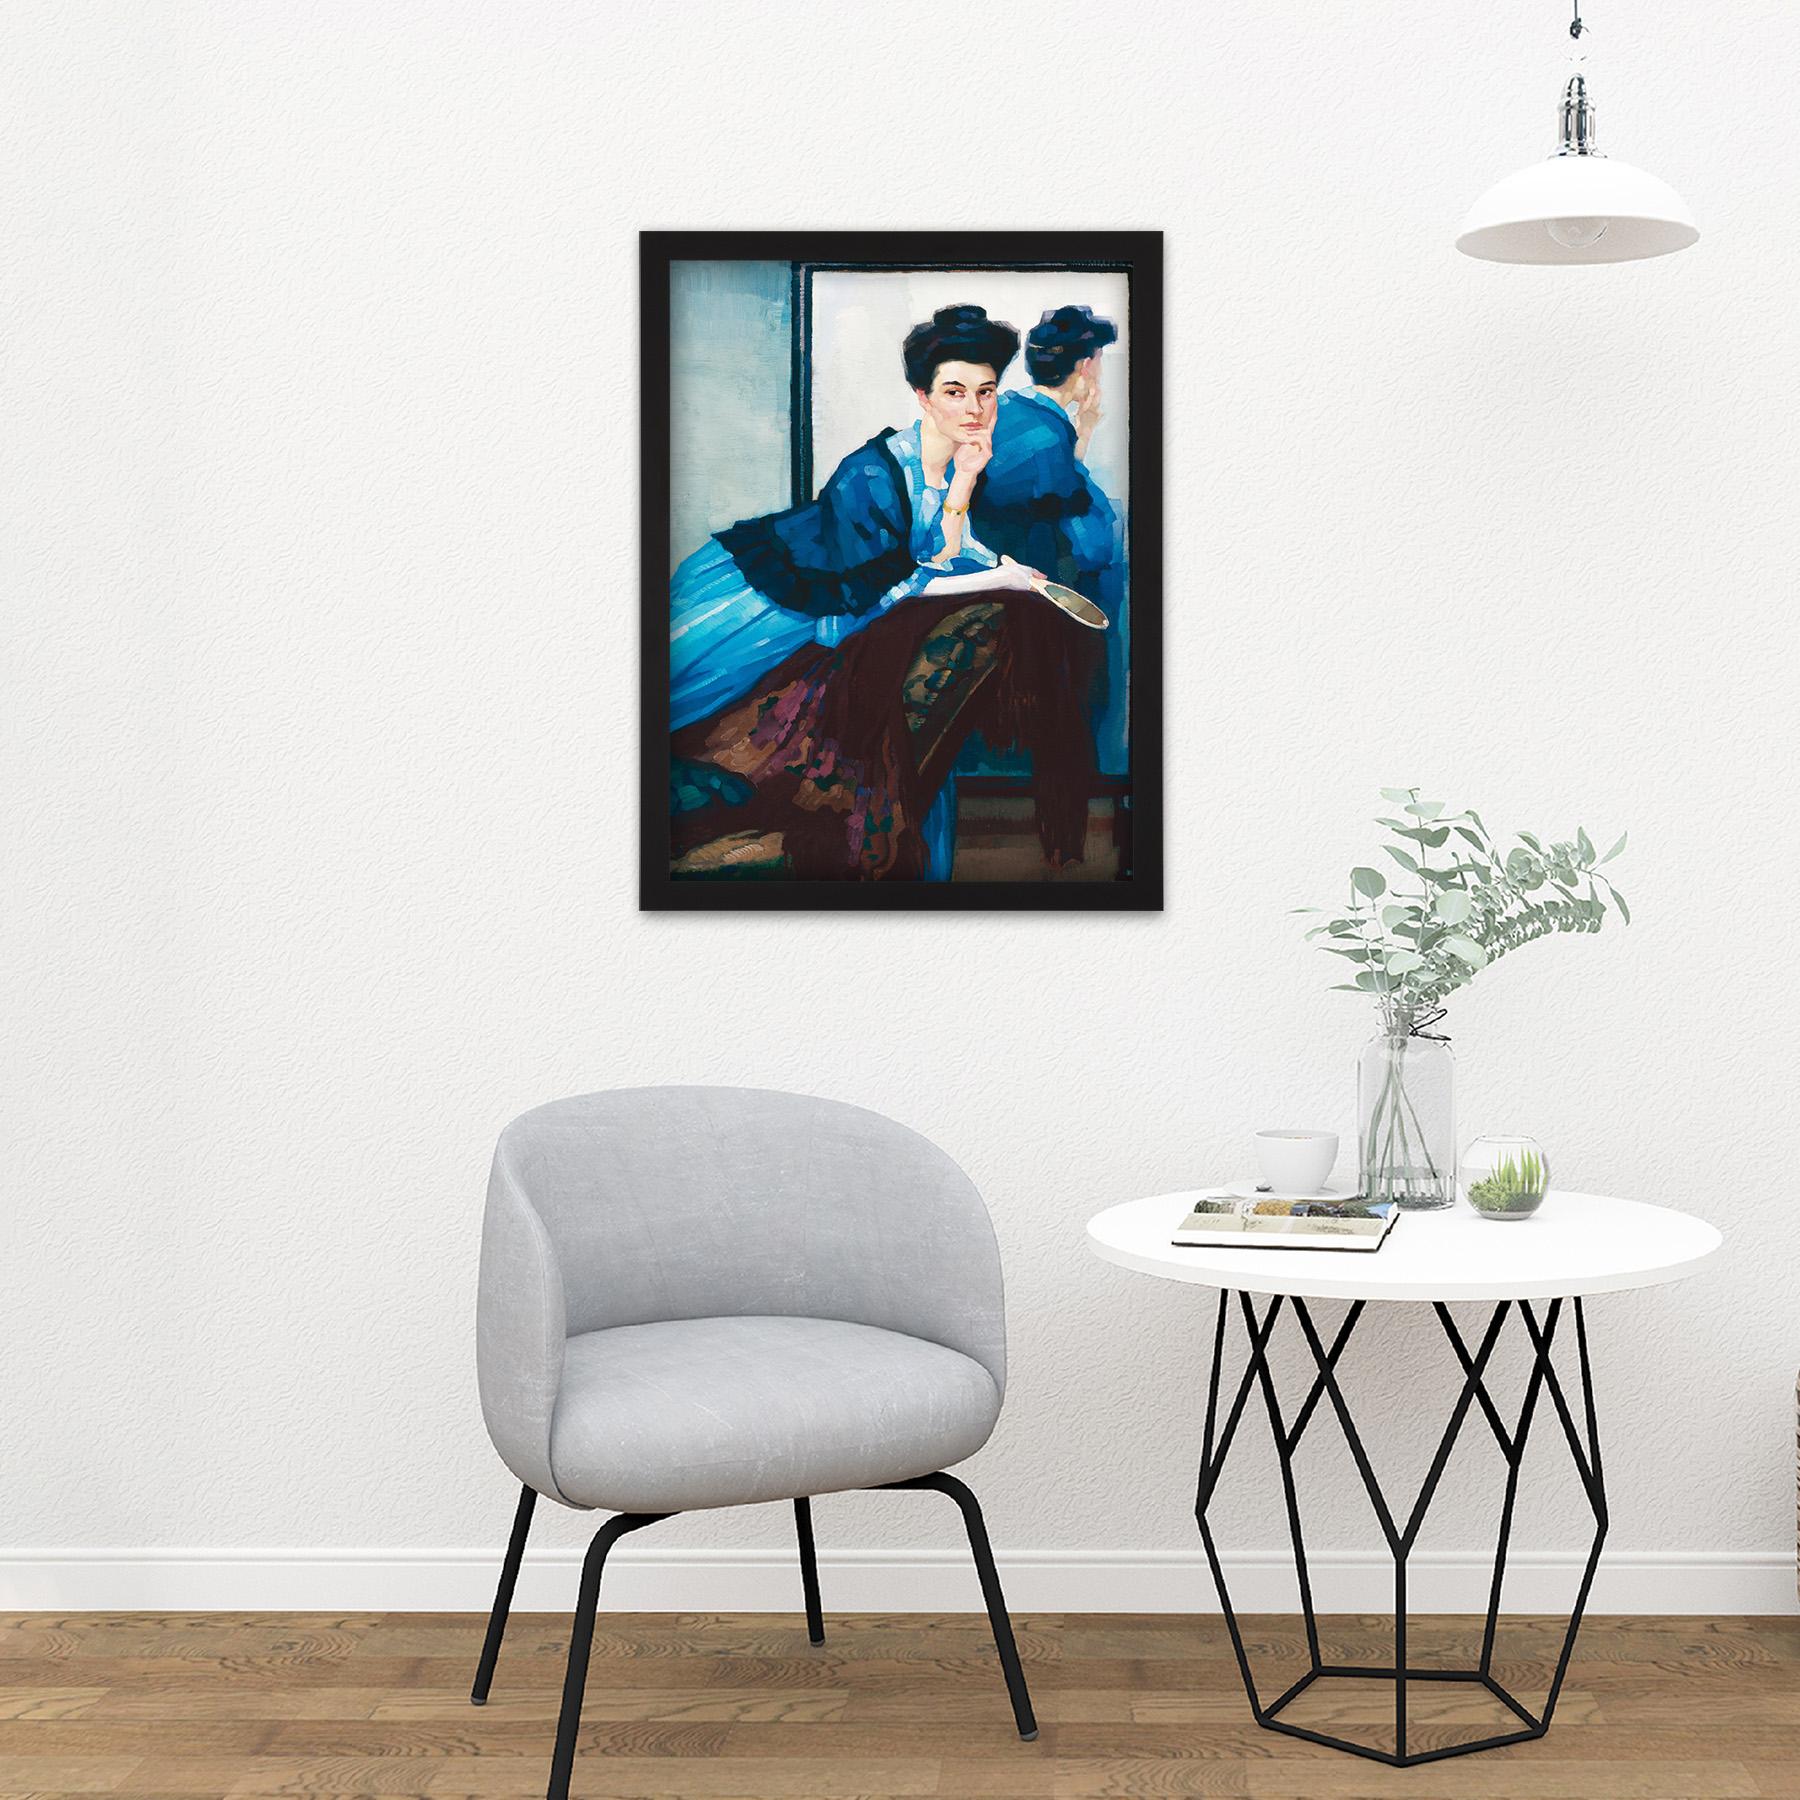 Putz-Woman-In-Blue-Dress-Painting-Large-Framed-Art-Print thumbnail 8